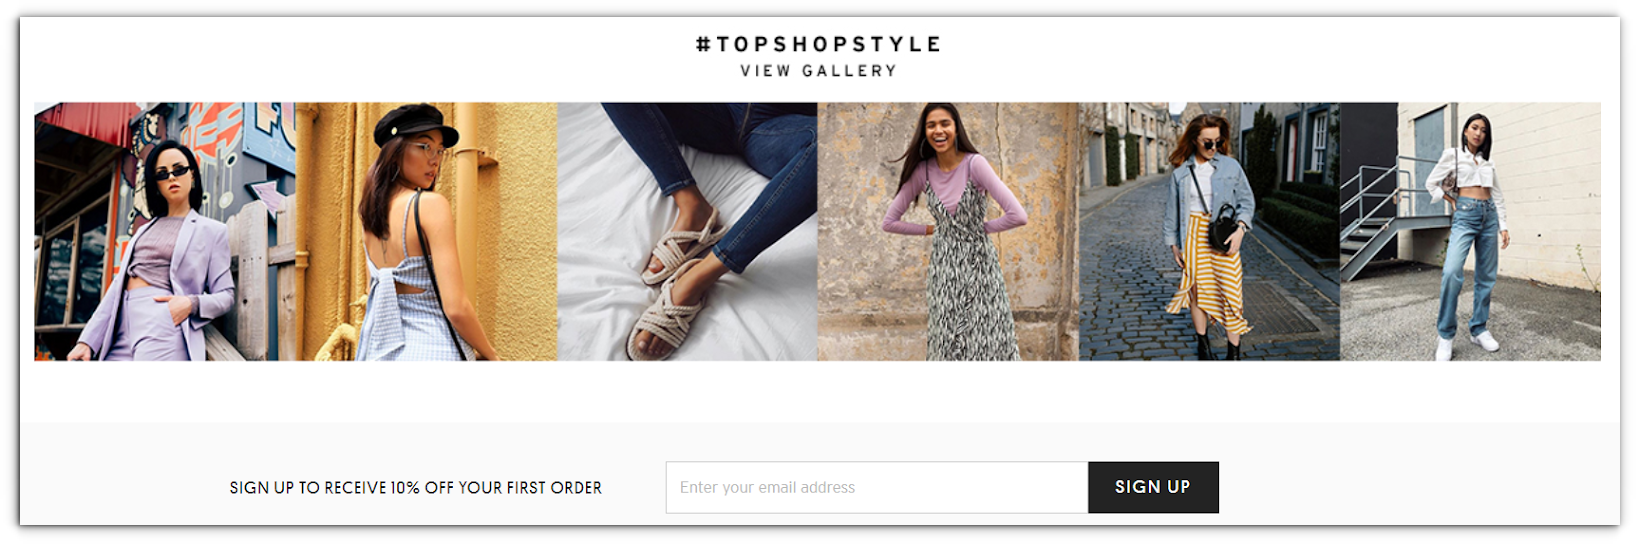 Top Shop - Ecommerce Business - Sendlane